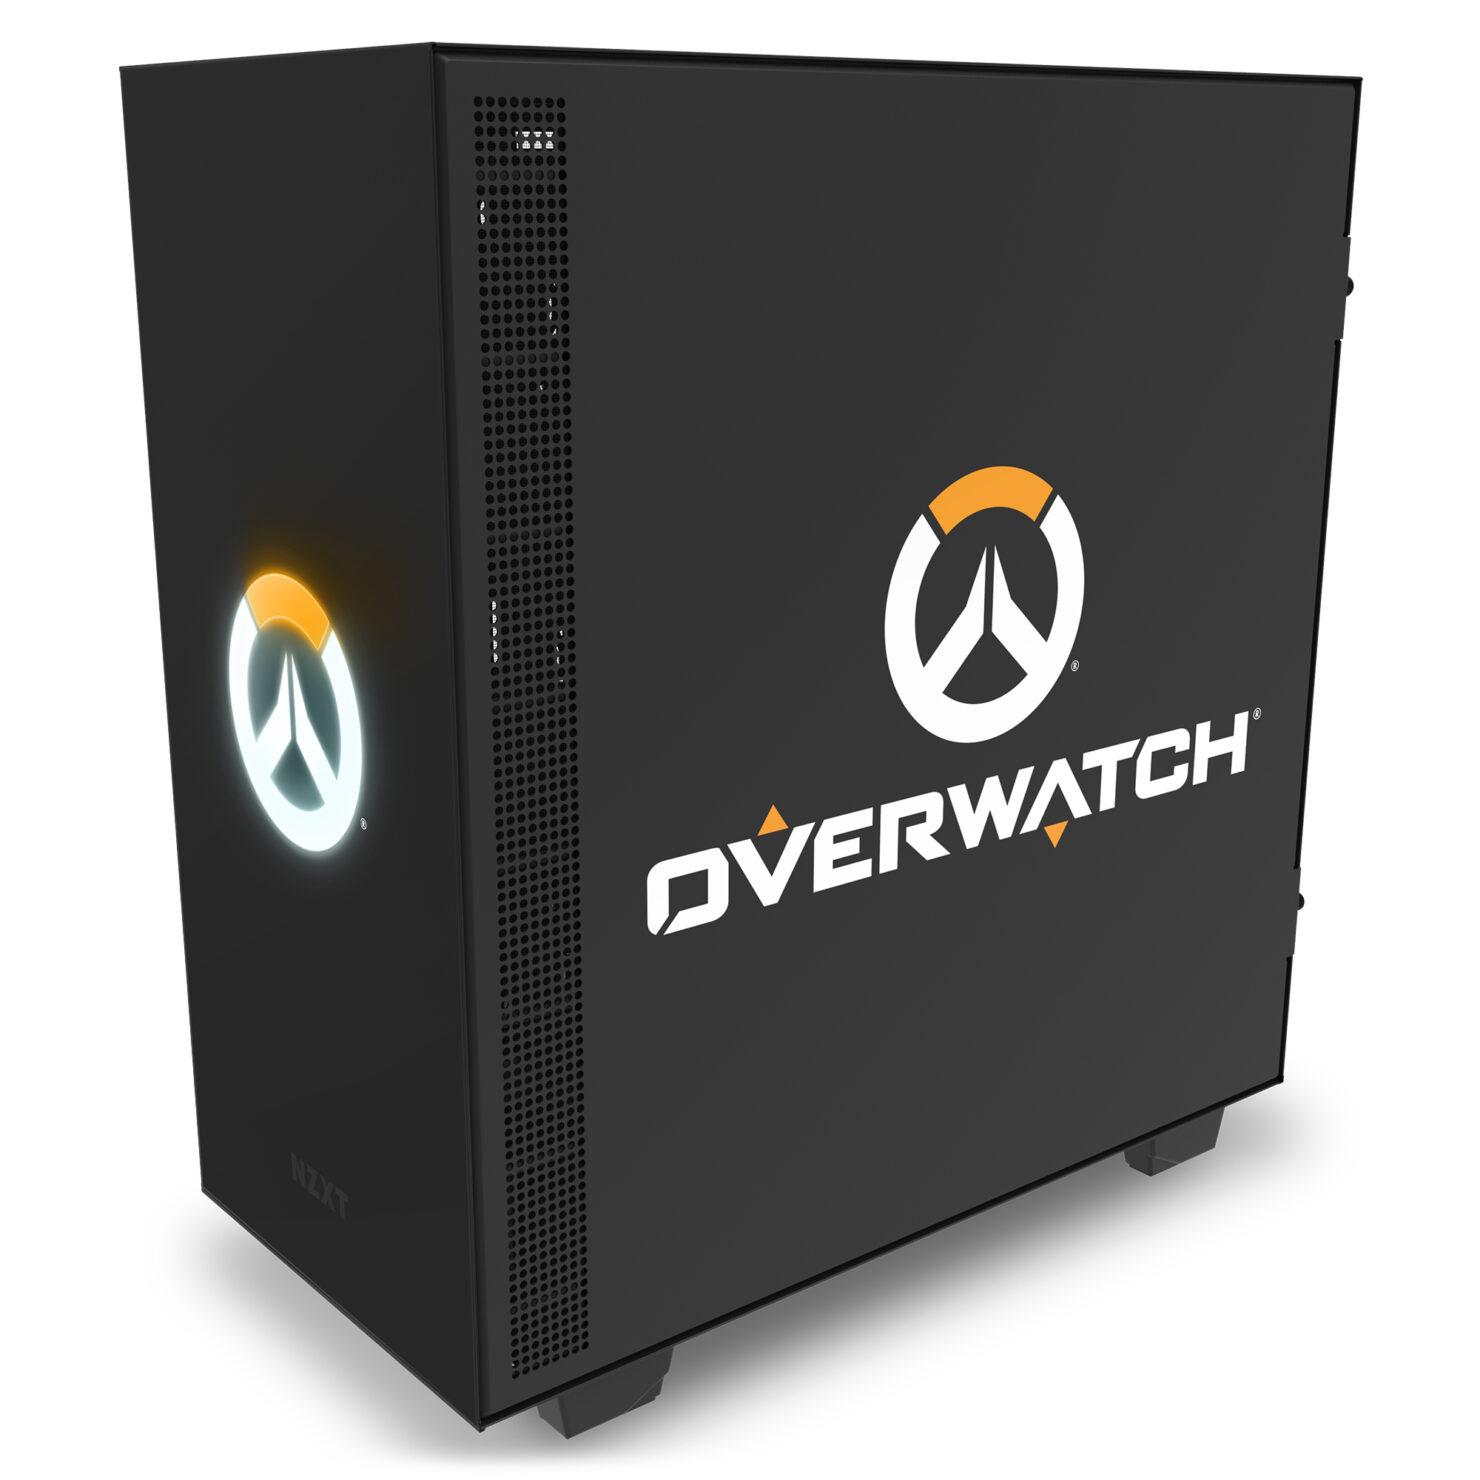 h500-overwatch_nosystem-side-front